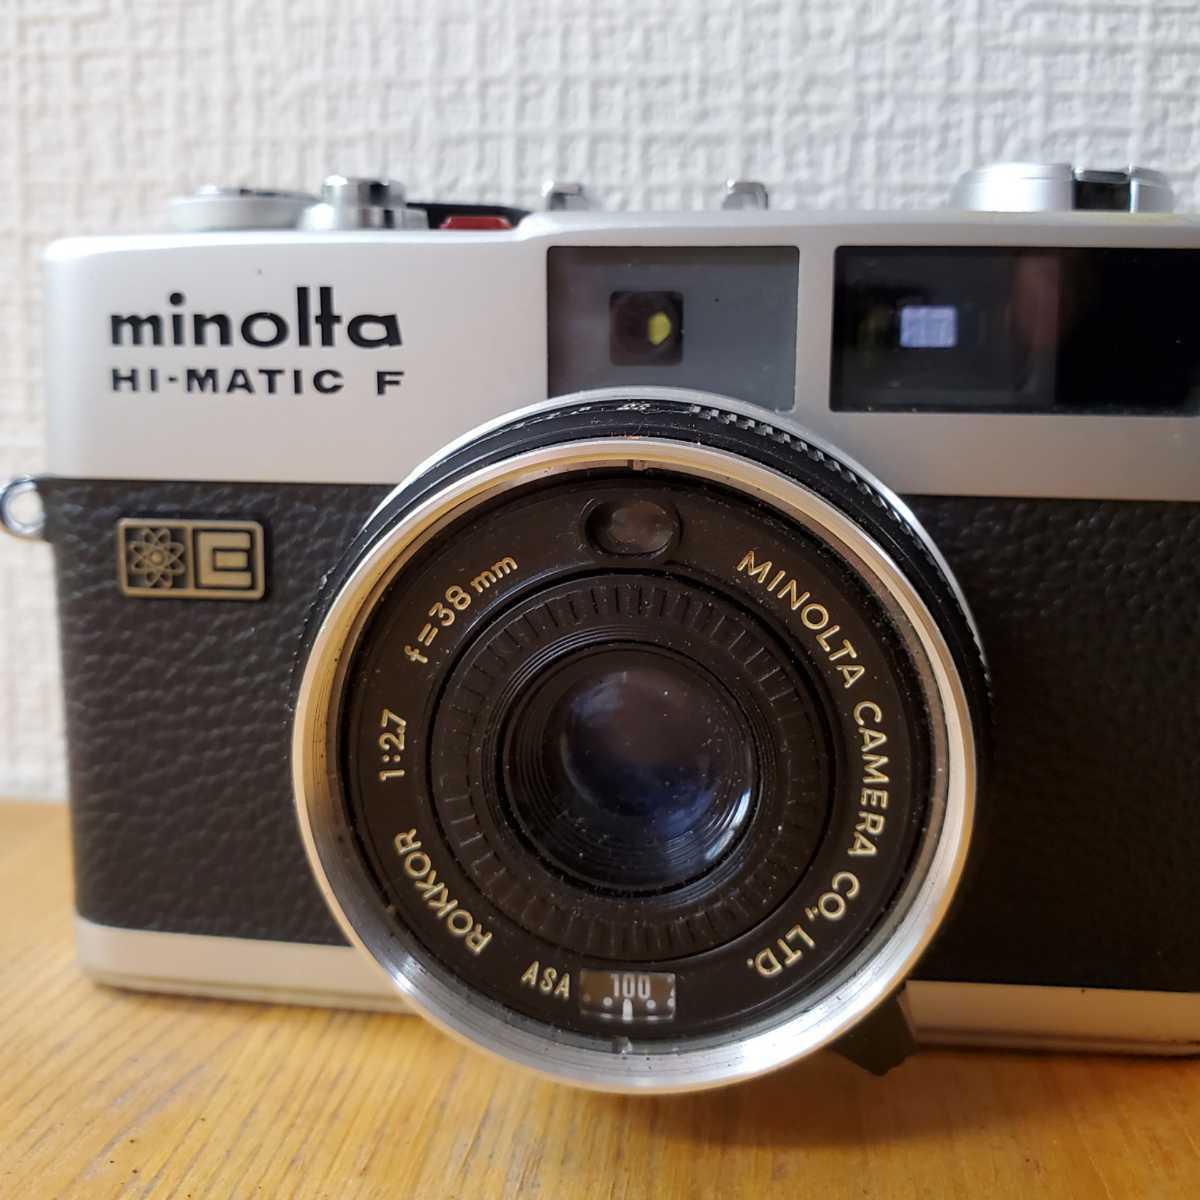 MINOLTA ミノルタ HI-MATIC F カメラ ROKKOR F=38mm 1:2.7_画像2